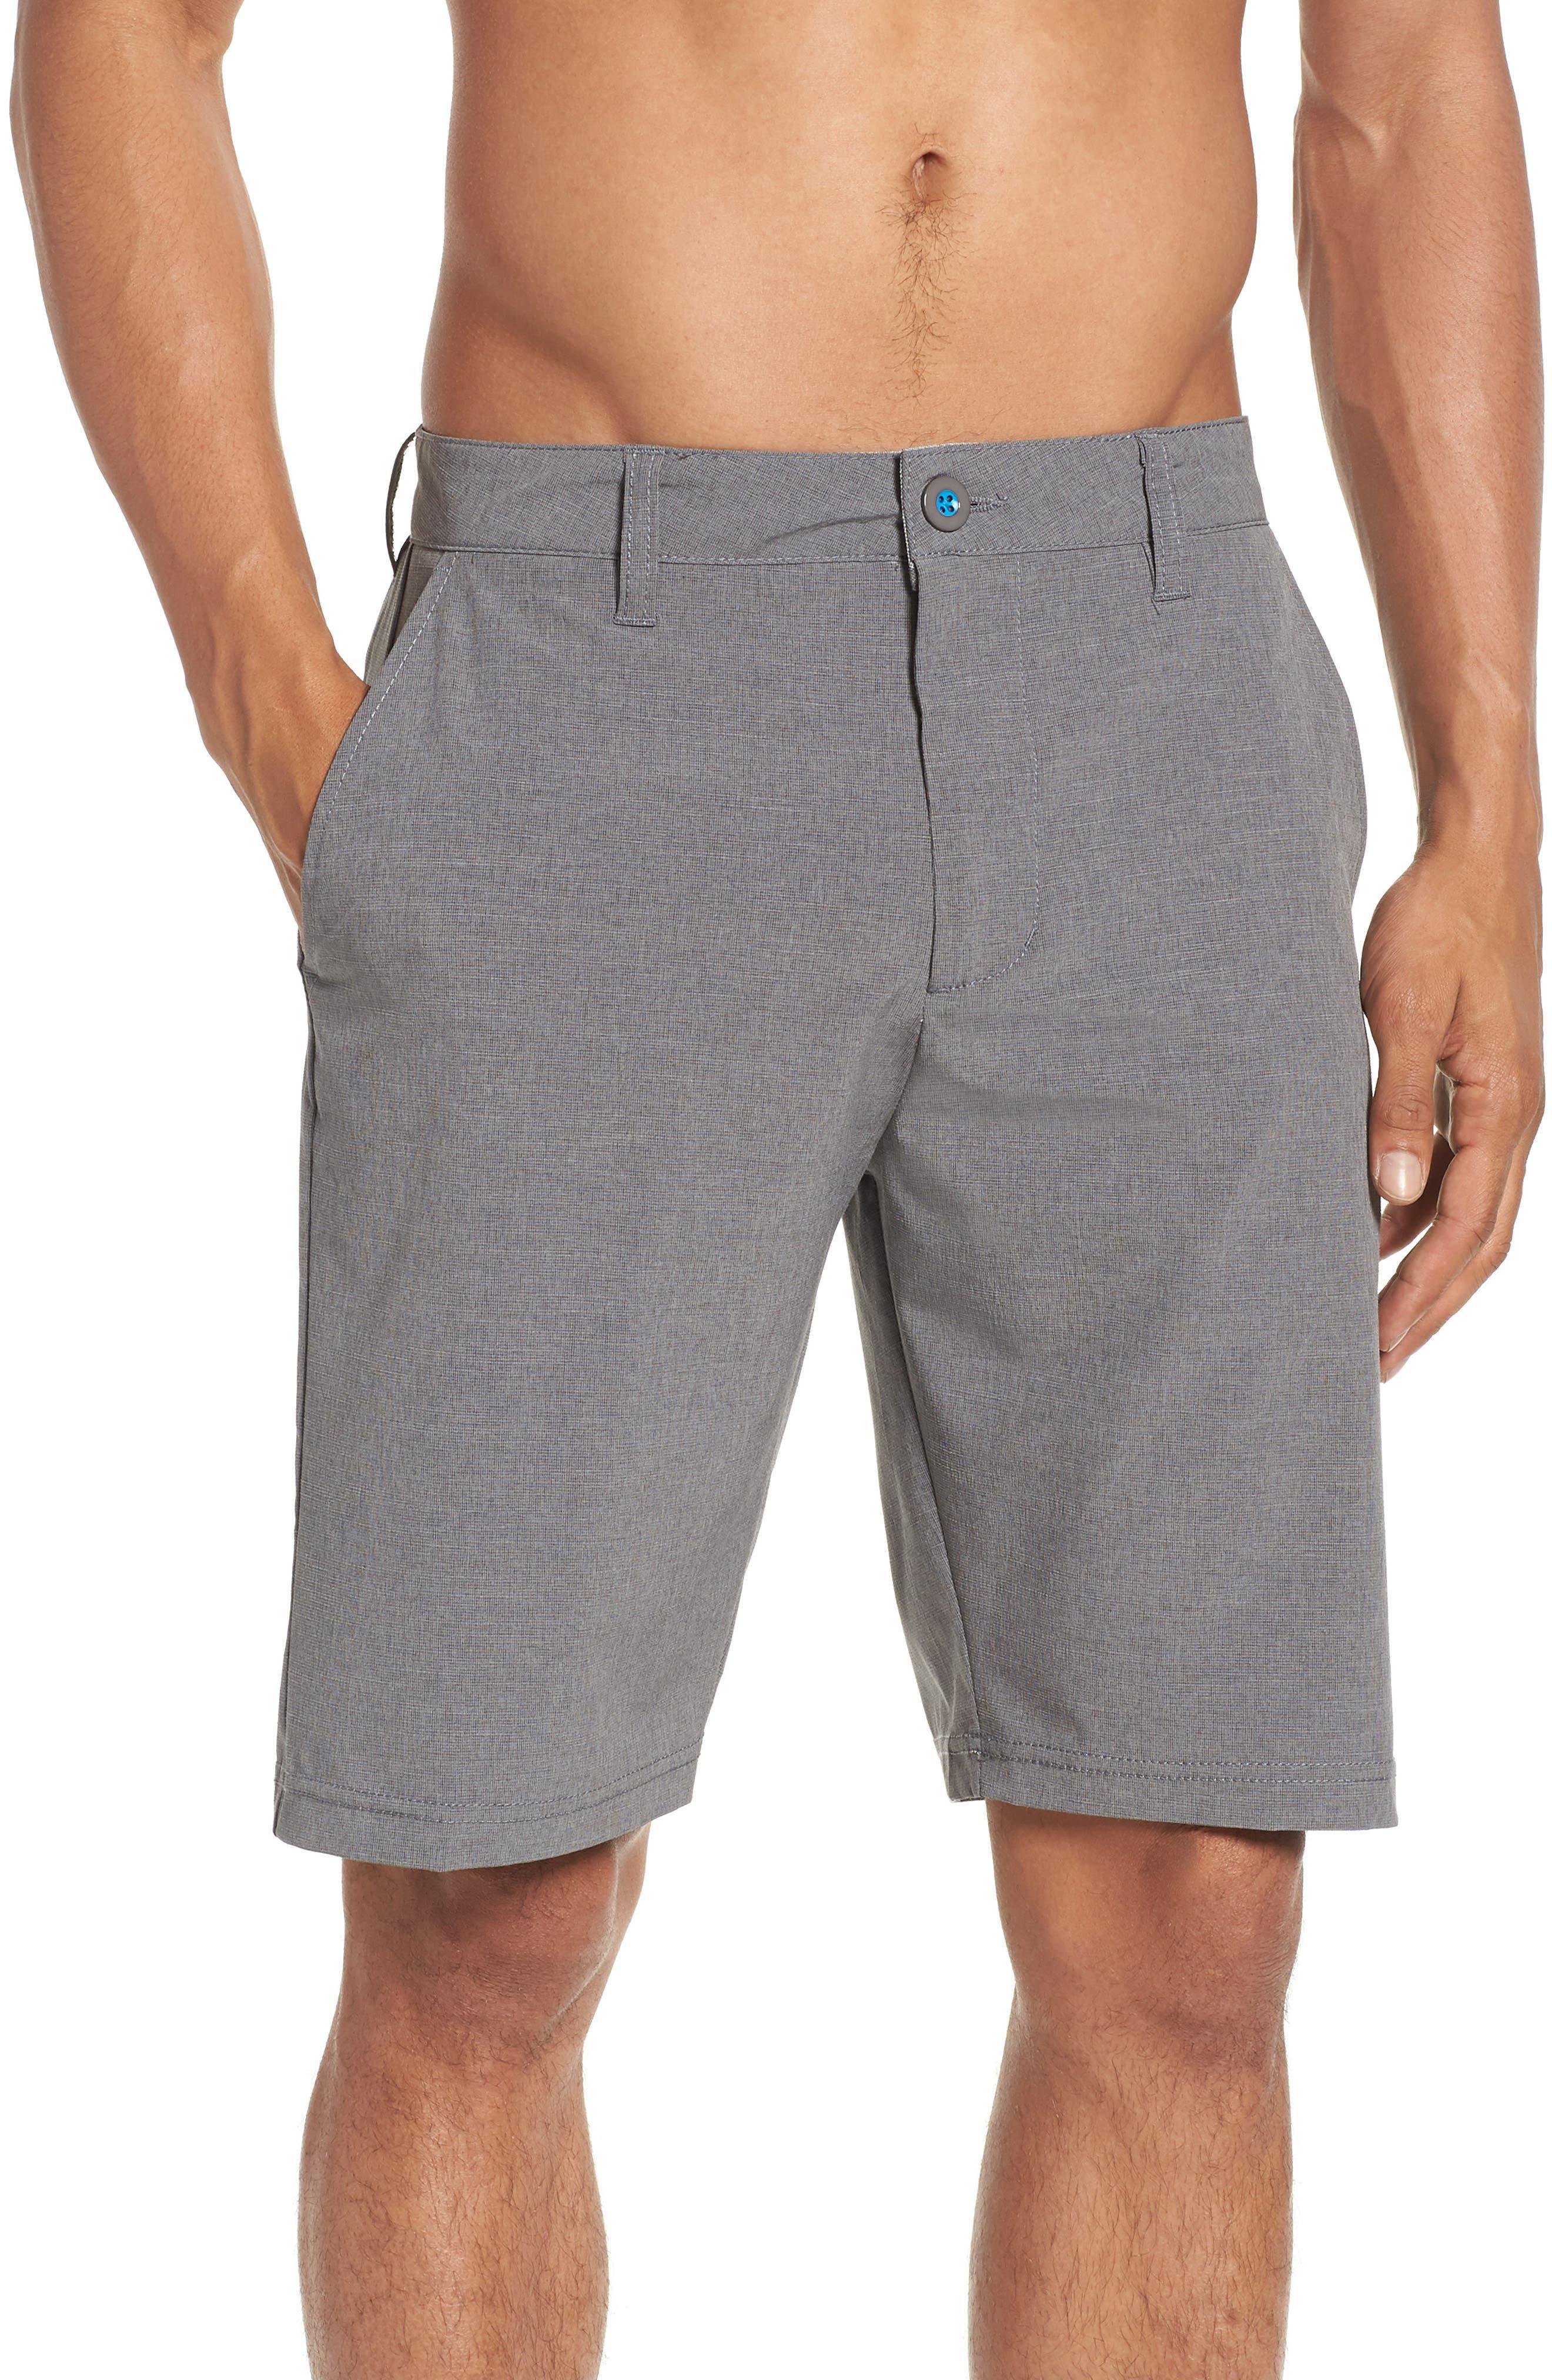 DEVEREUX, Cruiser Hybrid Shorts, Alternate thumbnail 4, color, CHARCOAL